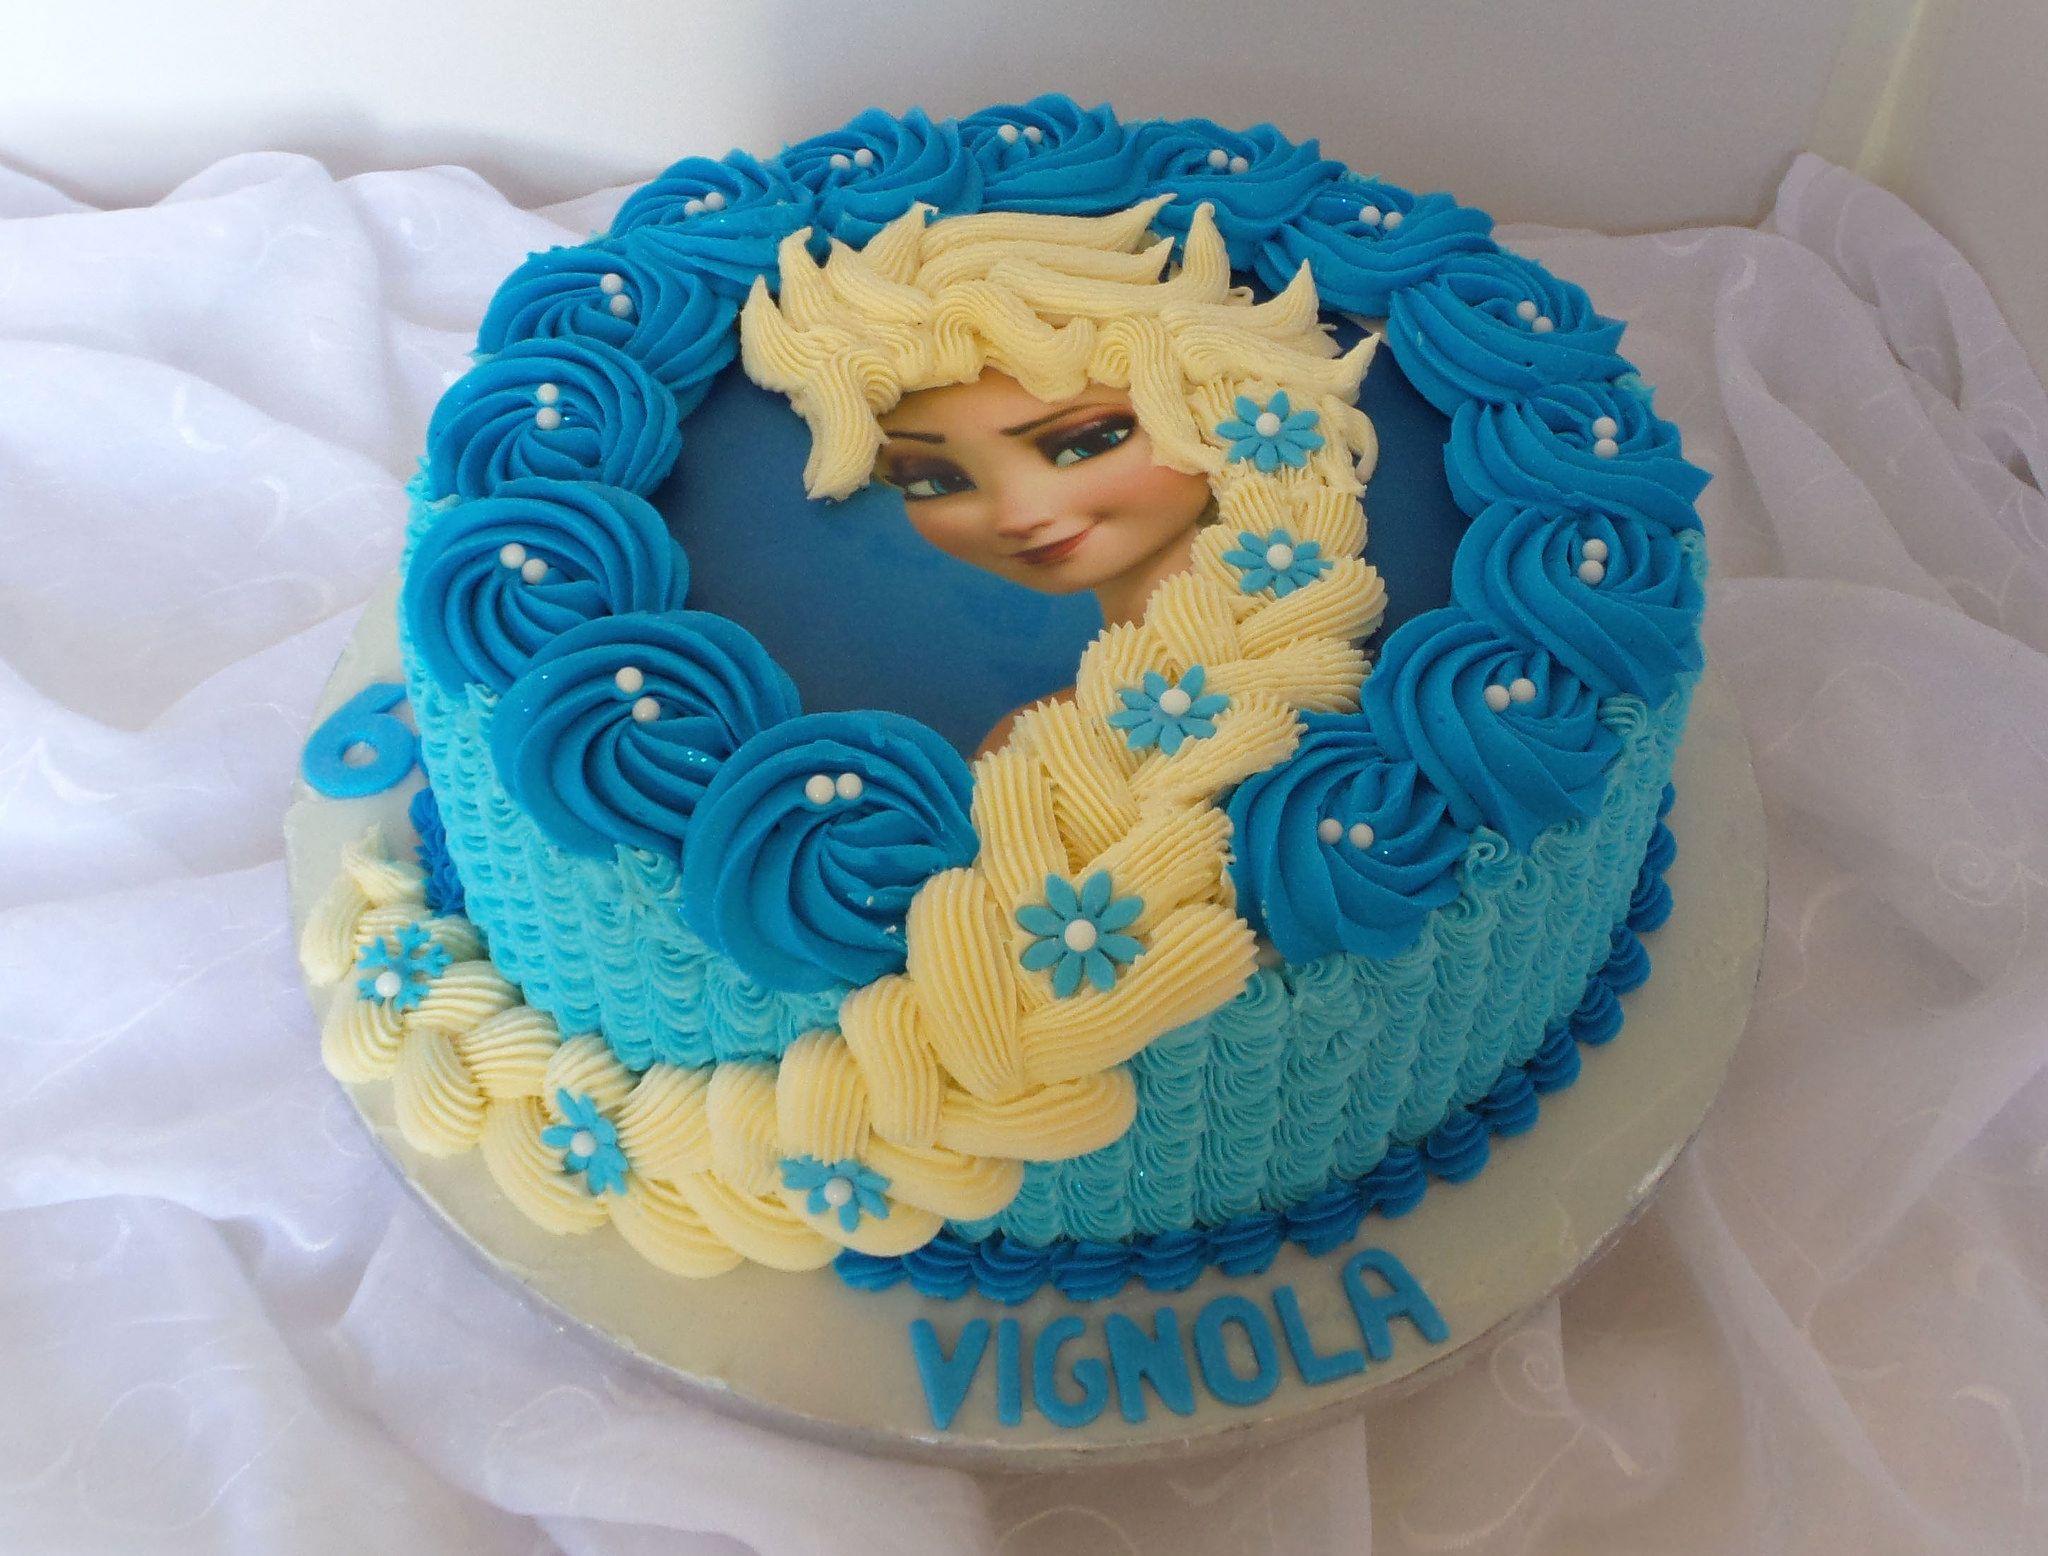 frozenElsa themed birthday cake Birthday cakes Cake and Bakeries